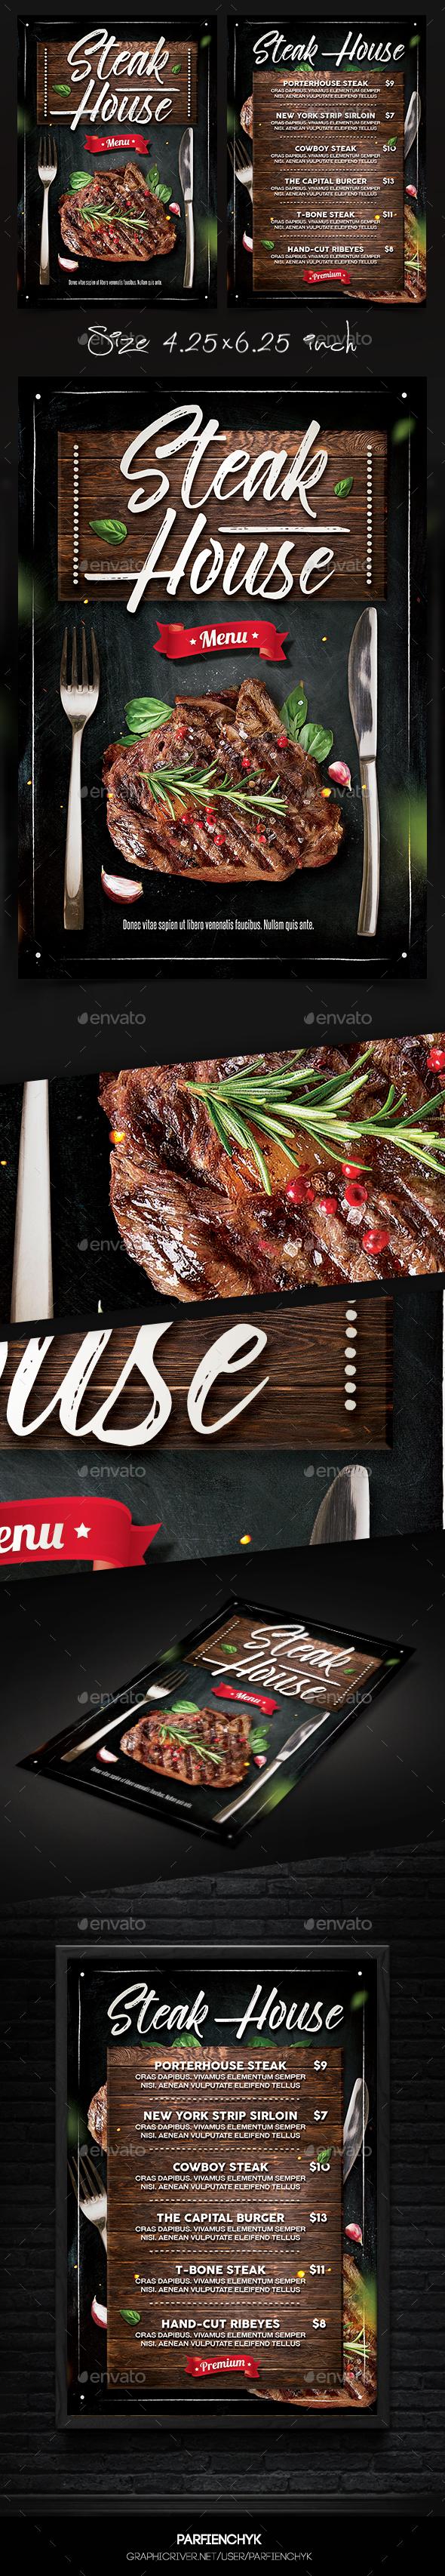 Steak Menu Flyer - Restaurant Flyers